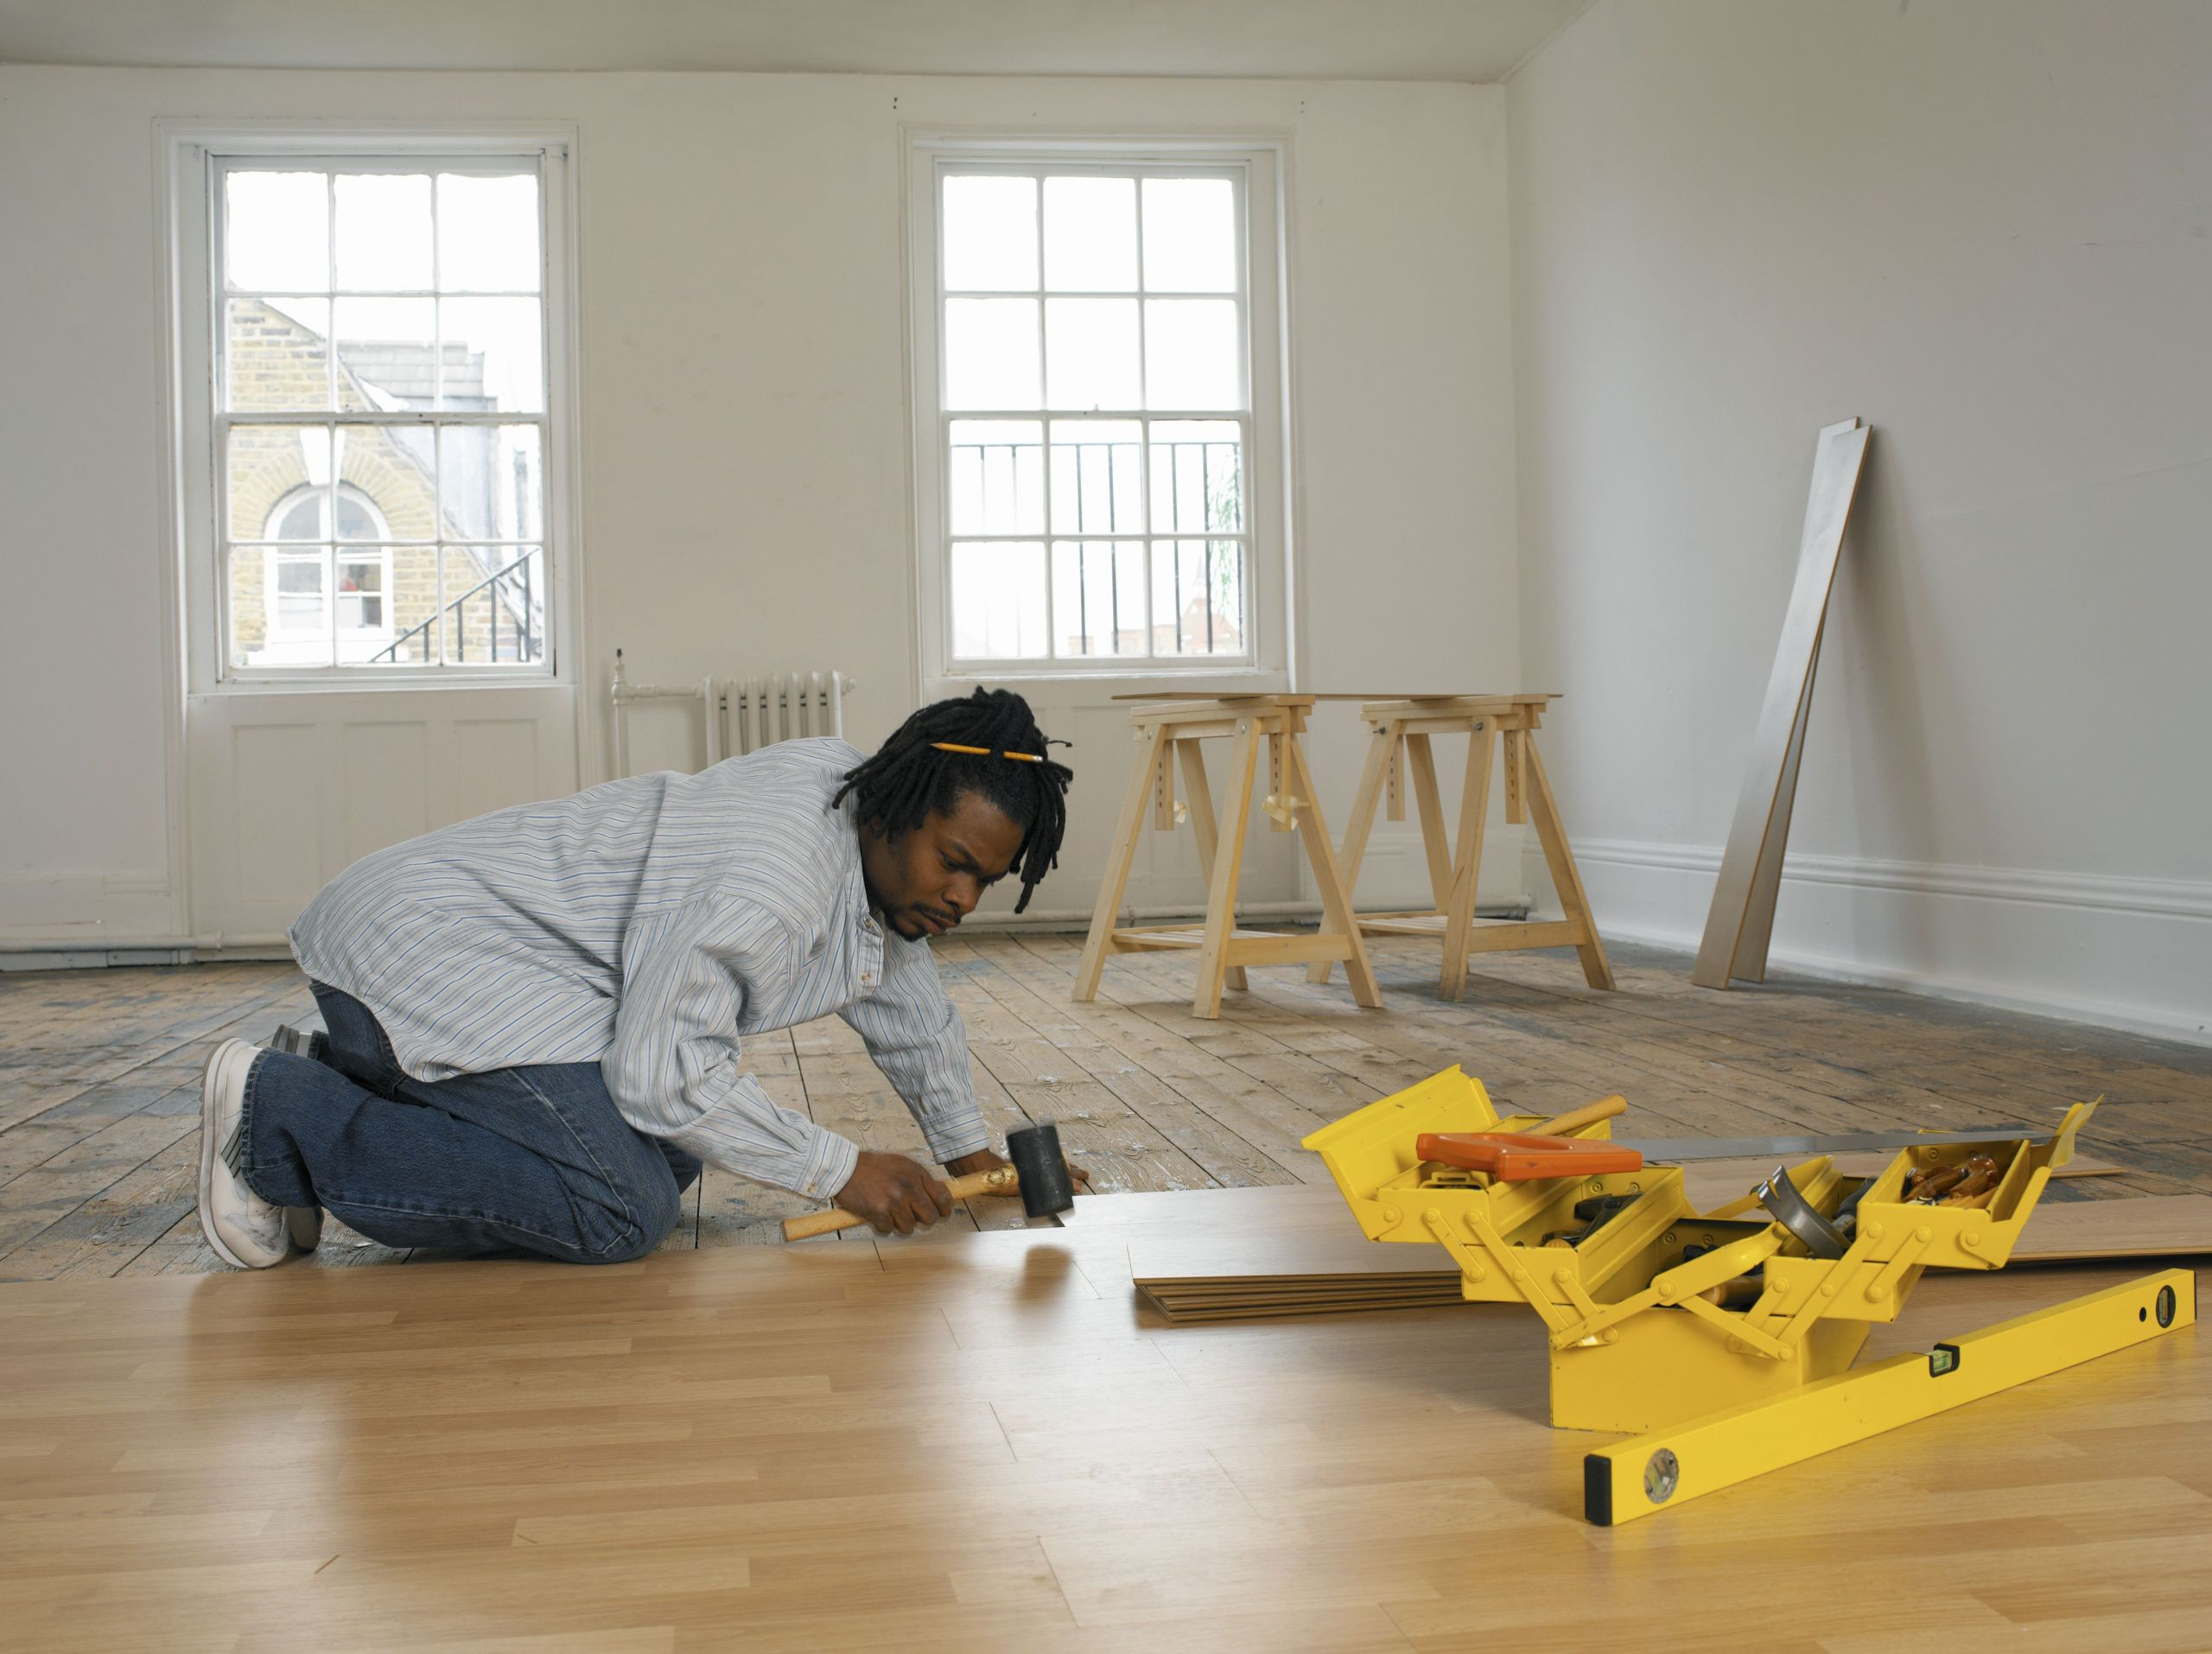 home depot grey hardwood flooring of major manufacturing brands for laminate flooring intended for laying laminate flooring